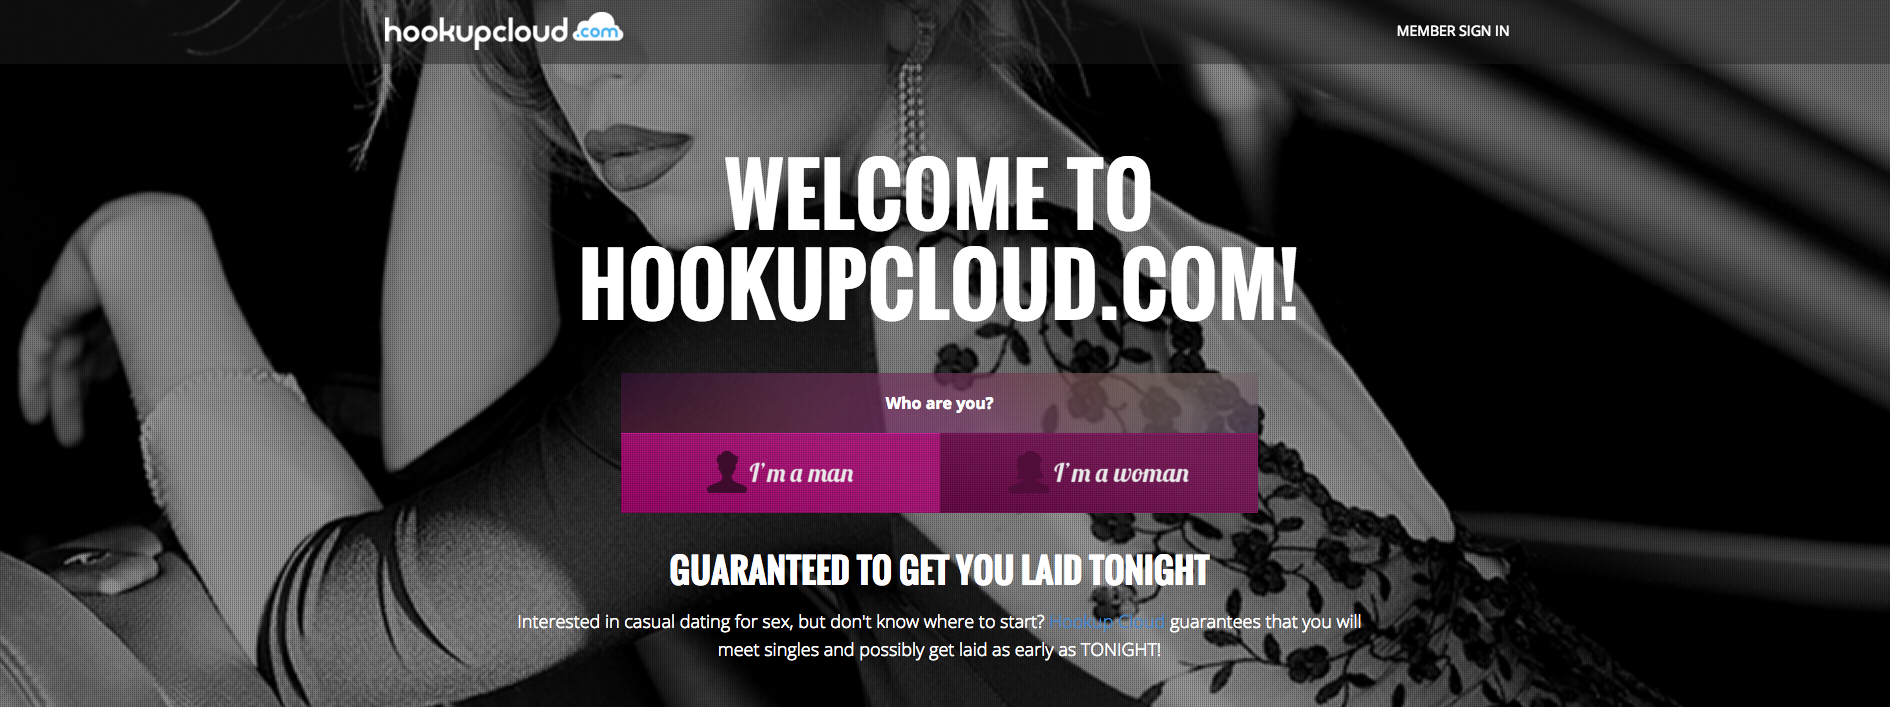 hookupcloud-review